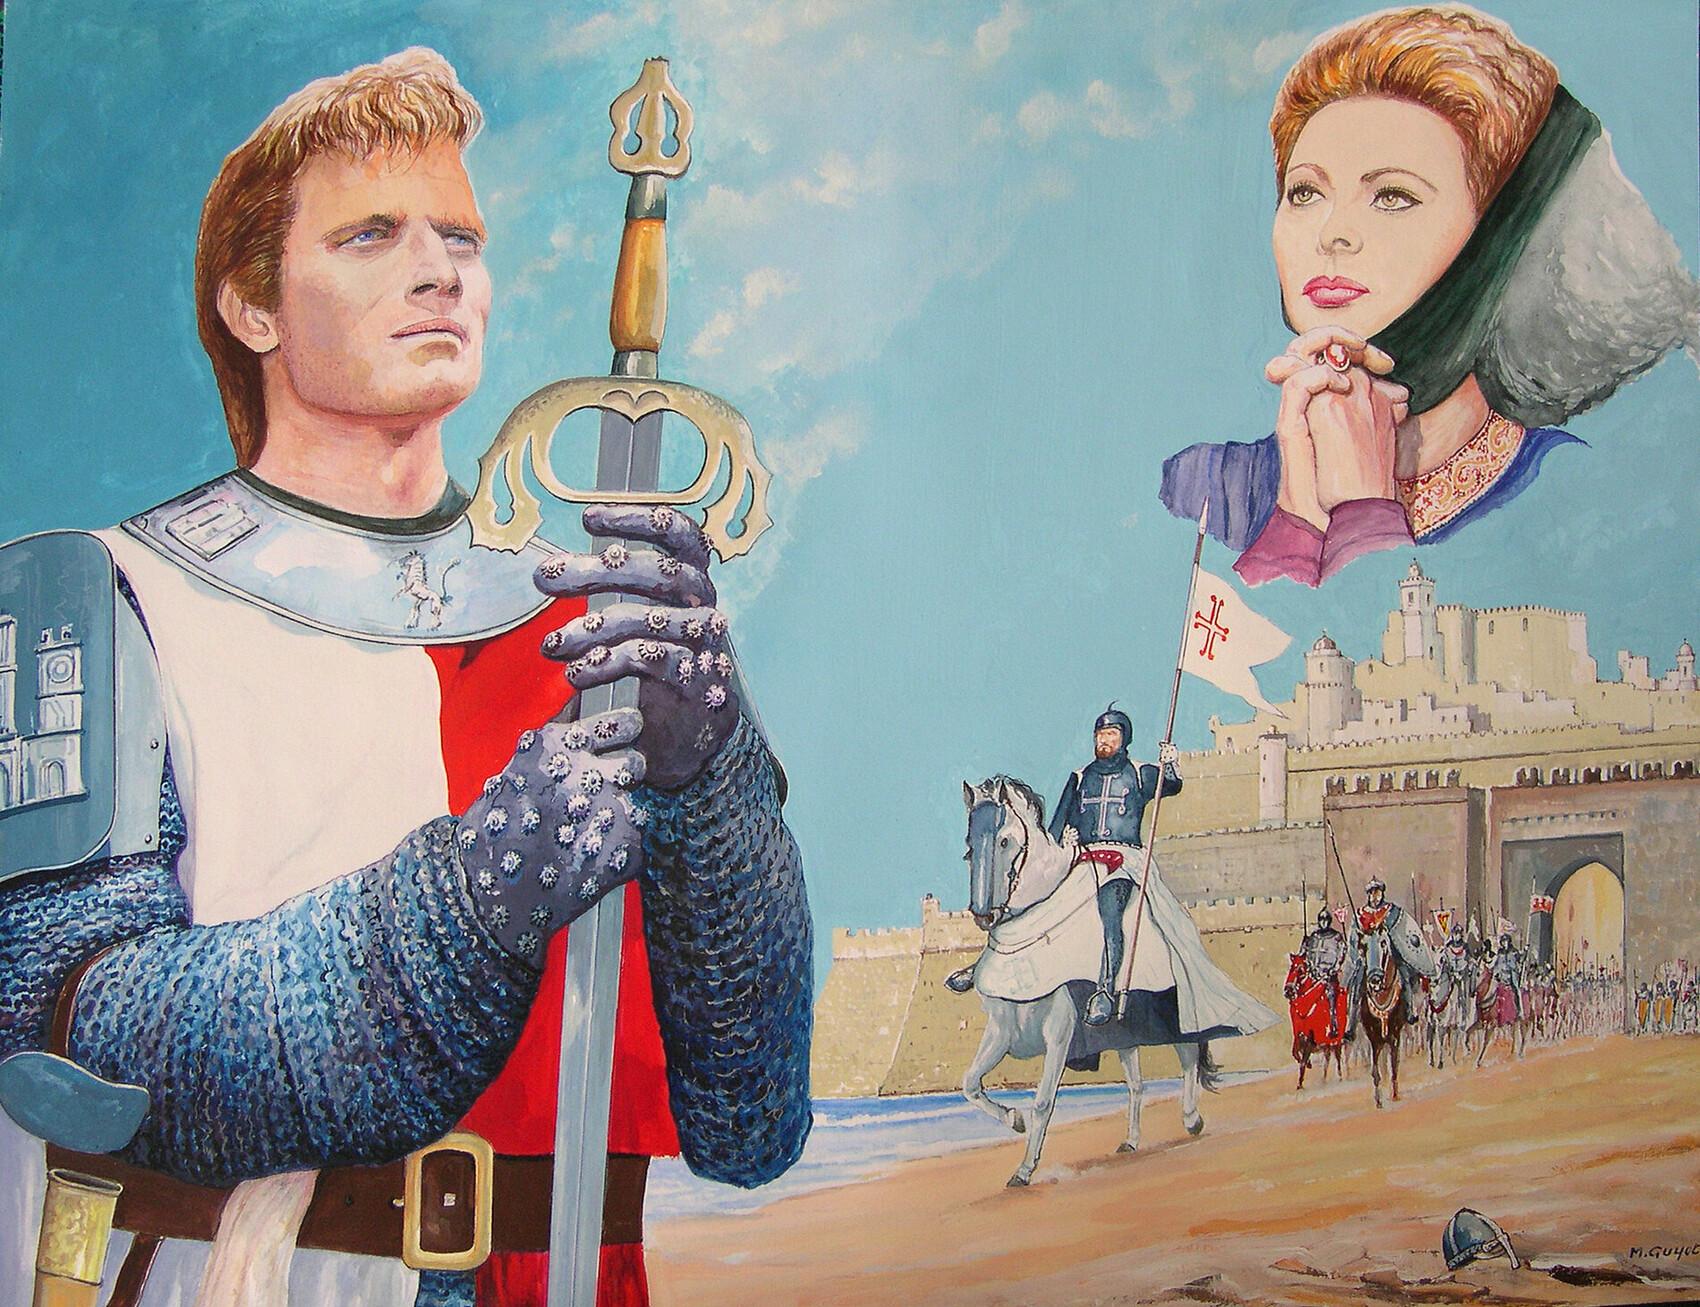 L'épée du Cid